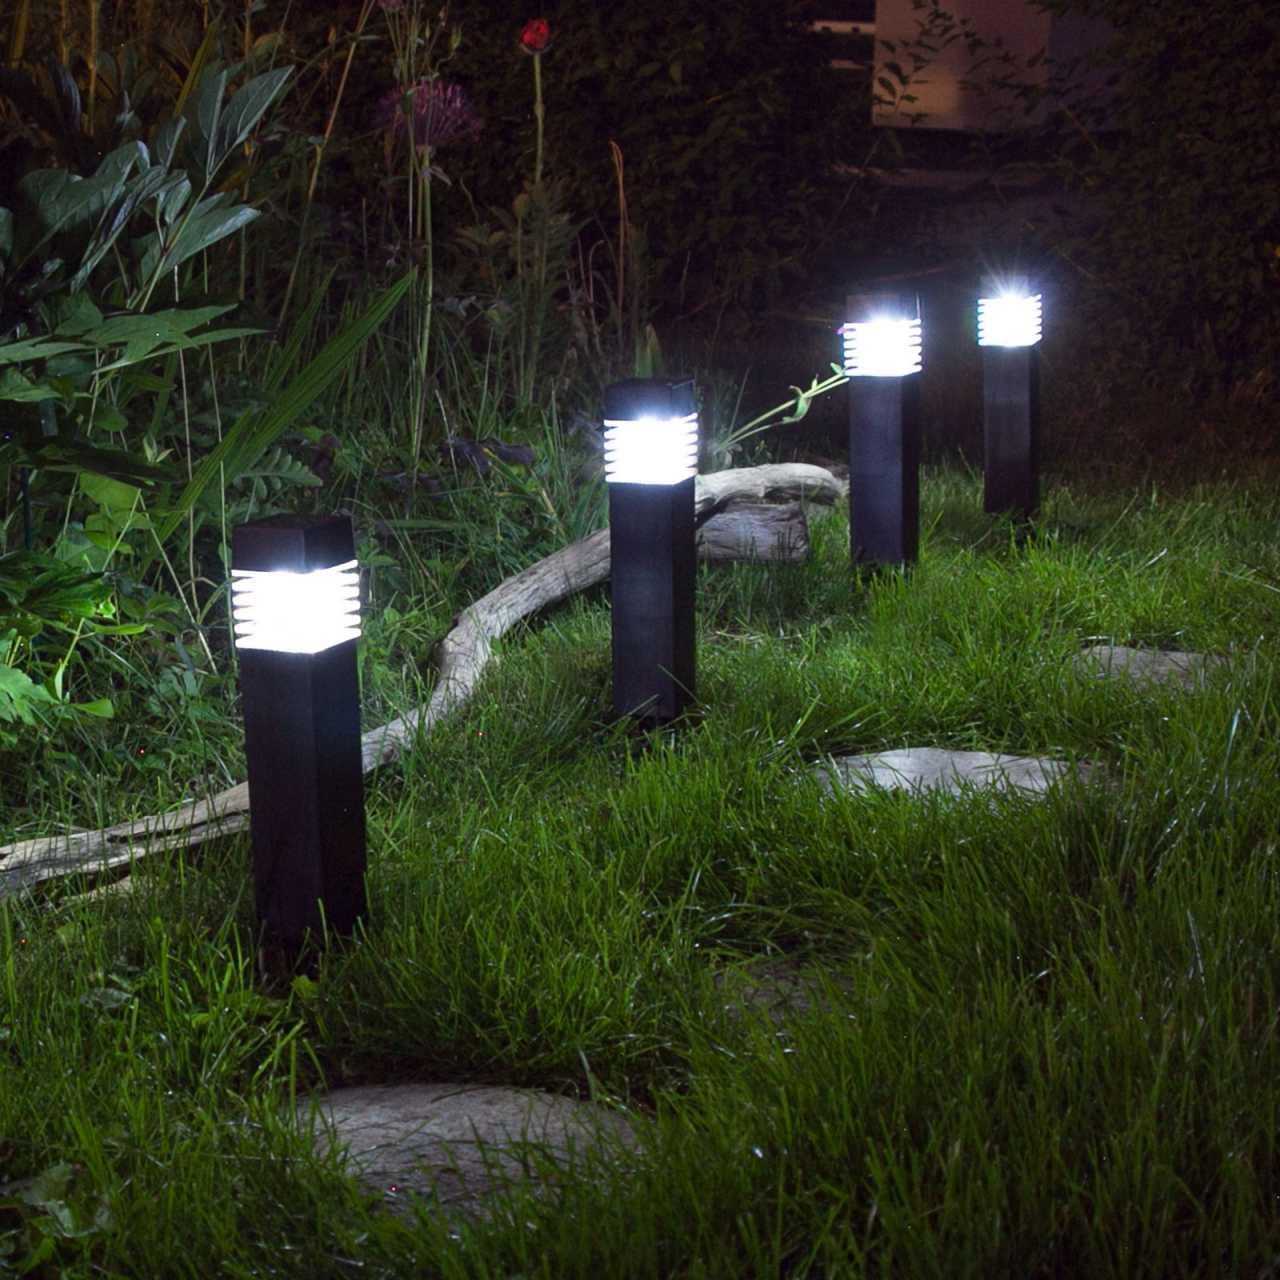 2x Grafner® Solar LED Gartenleuchte Solarlampe Solar Wegleuchte